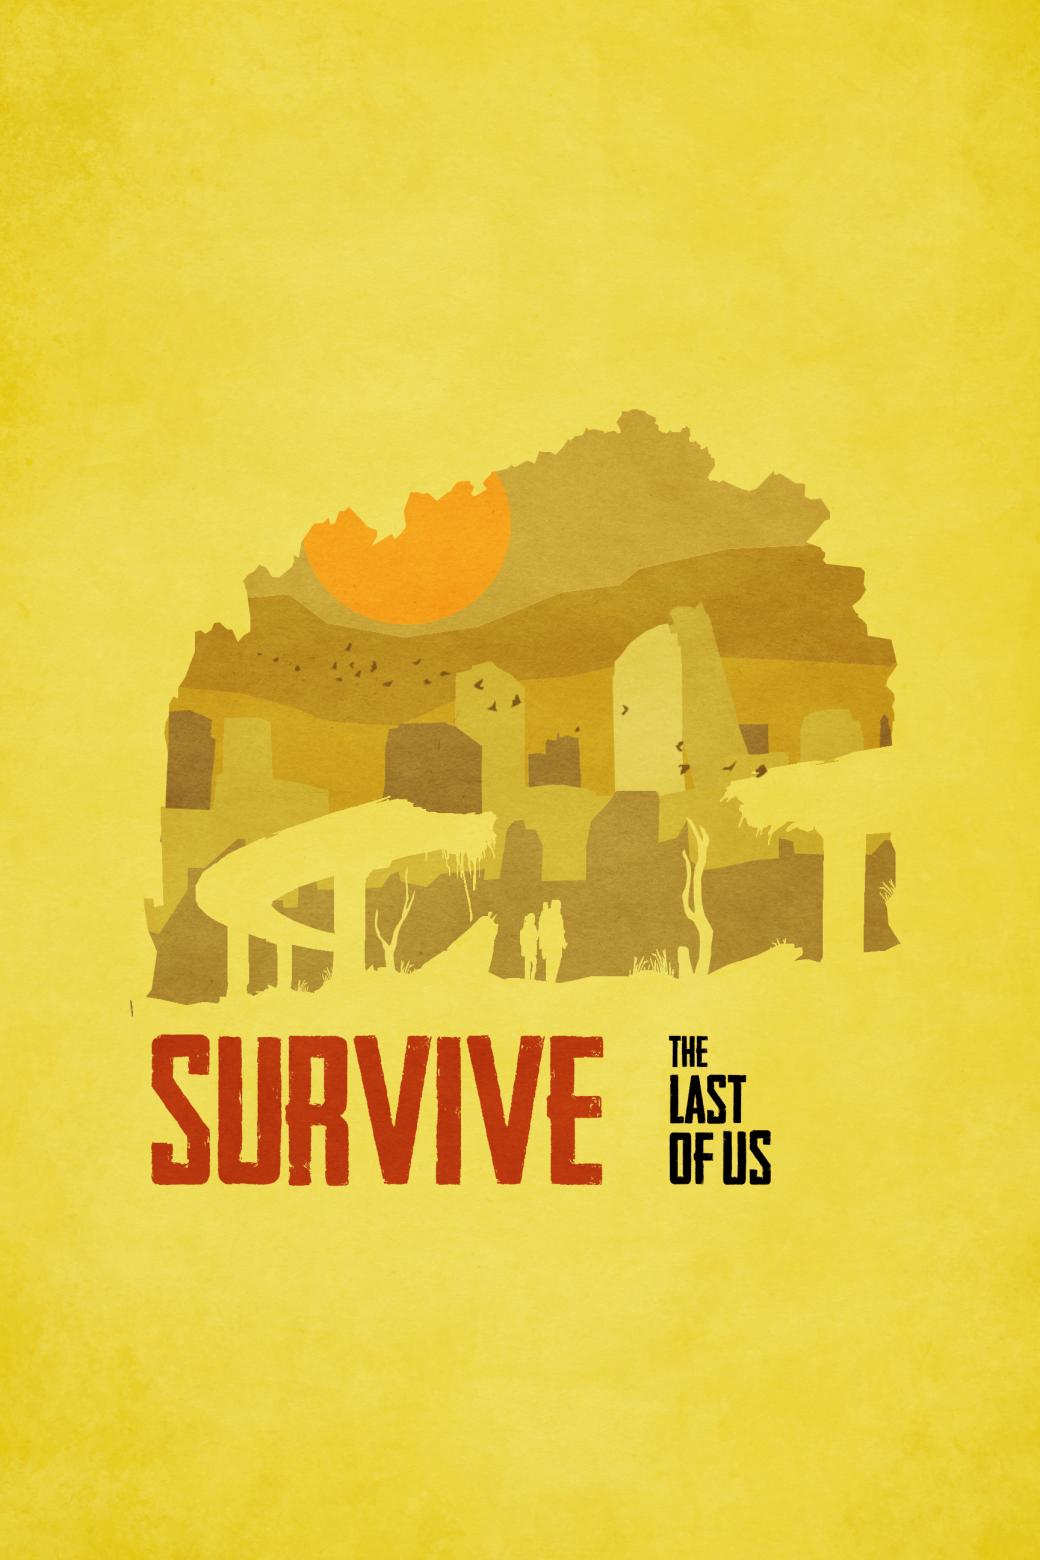 The Last of Us: живая классика или пустышка? - Изображение 16